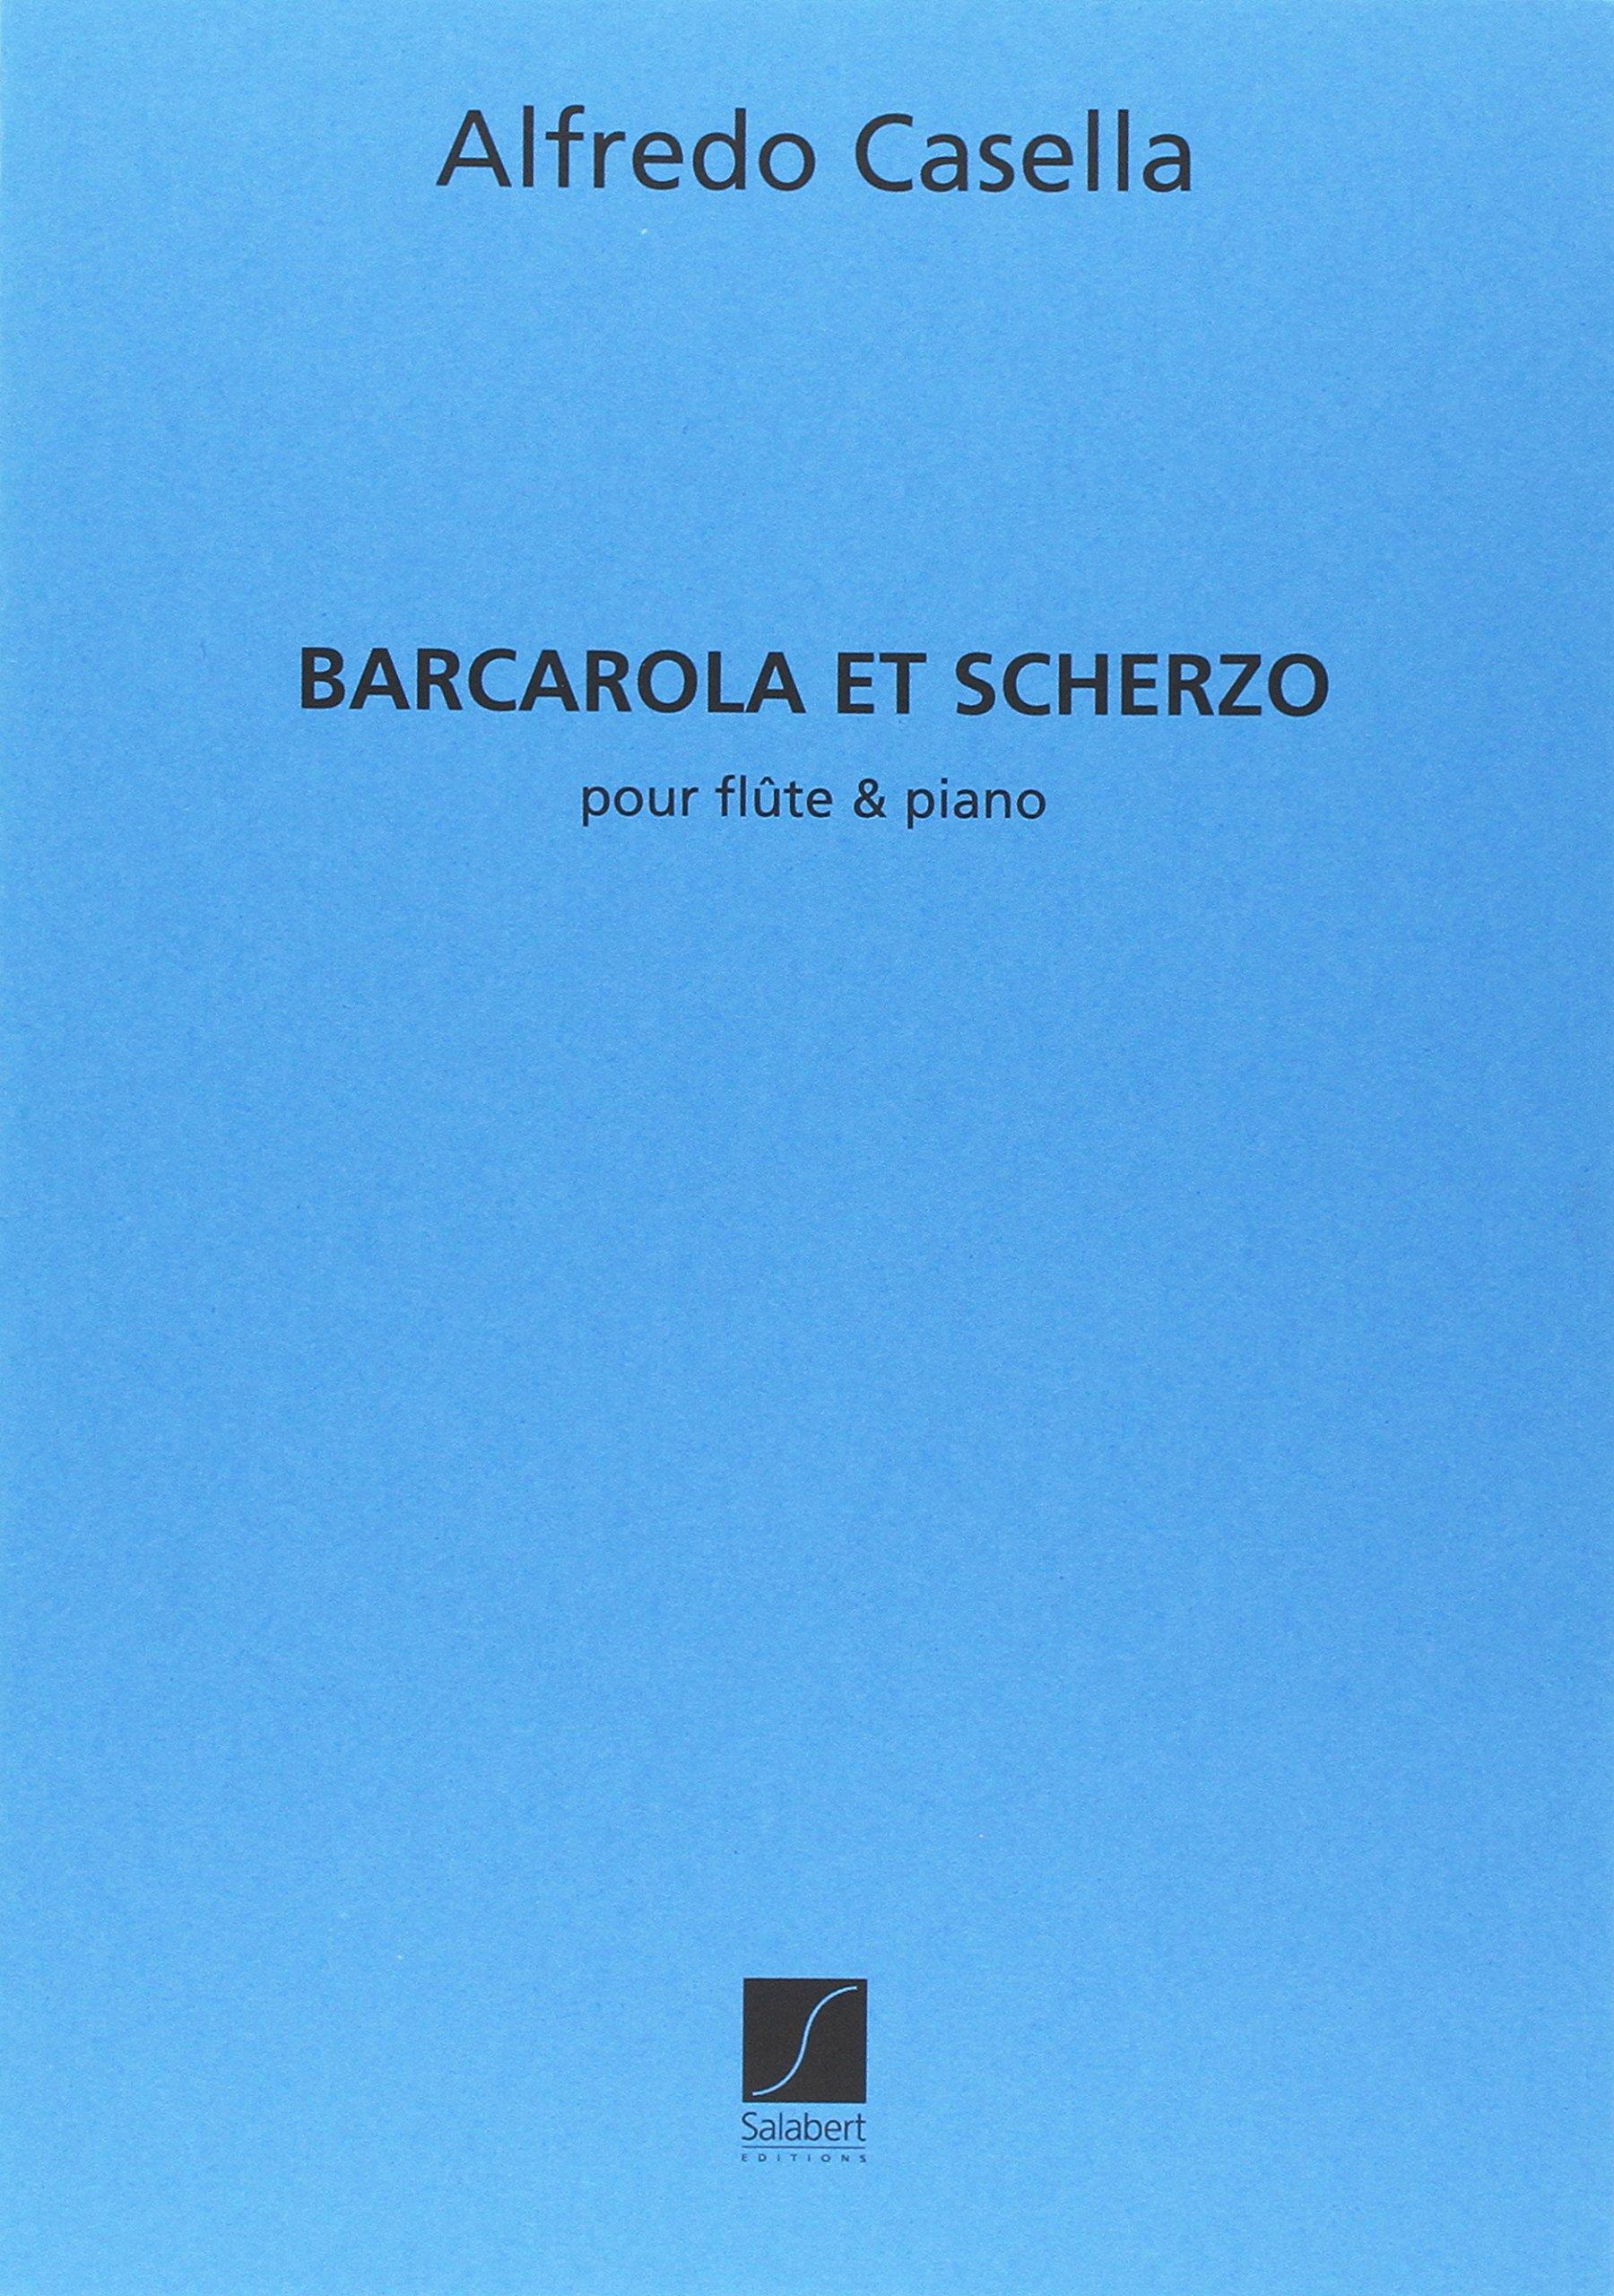 Barcarola Et Scherzo Flute-Piano (Tedesco) Copertina flessibile – 1 gen 2002 Alfredo Casella Editions Salabert 0048005835 95850